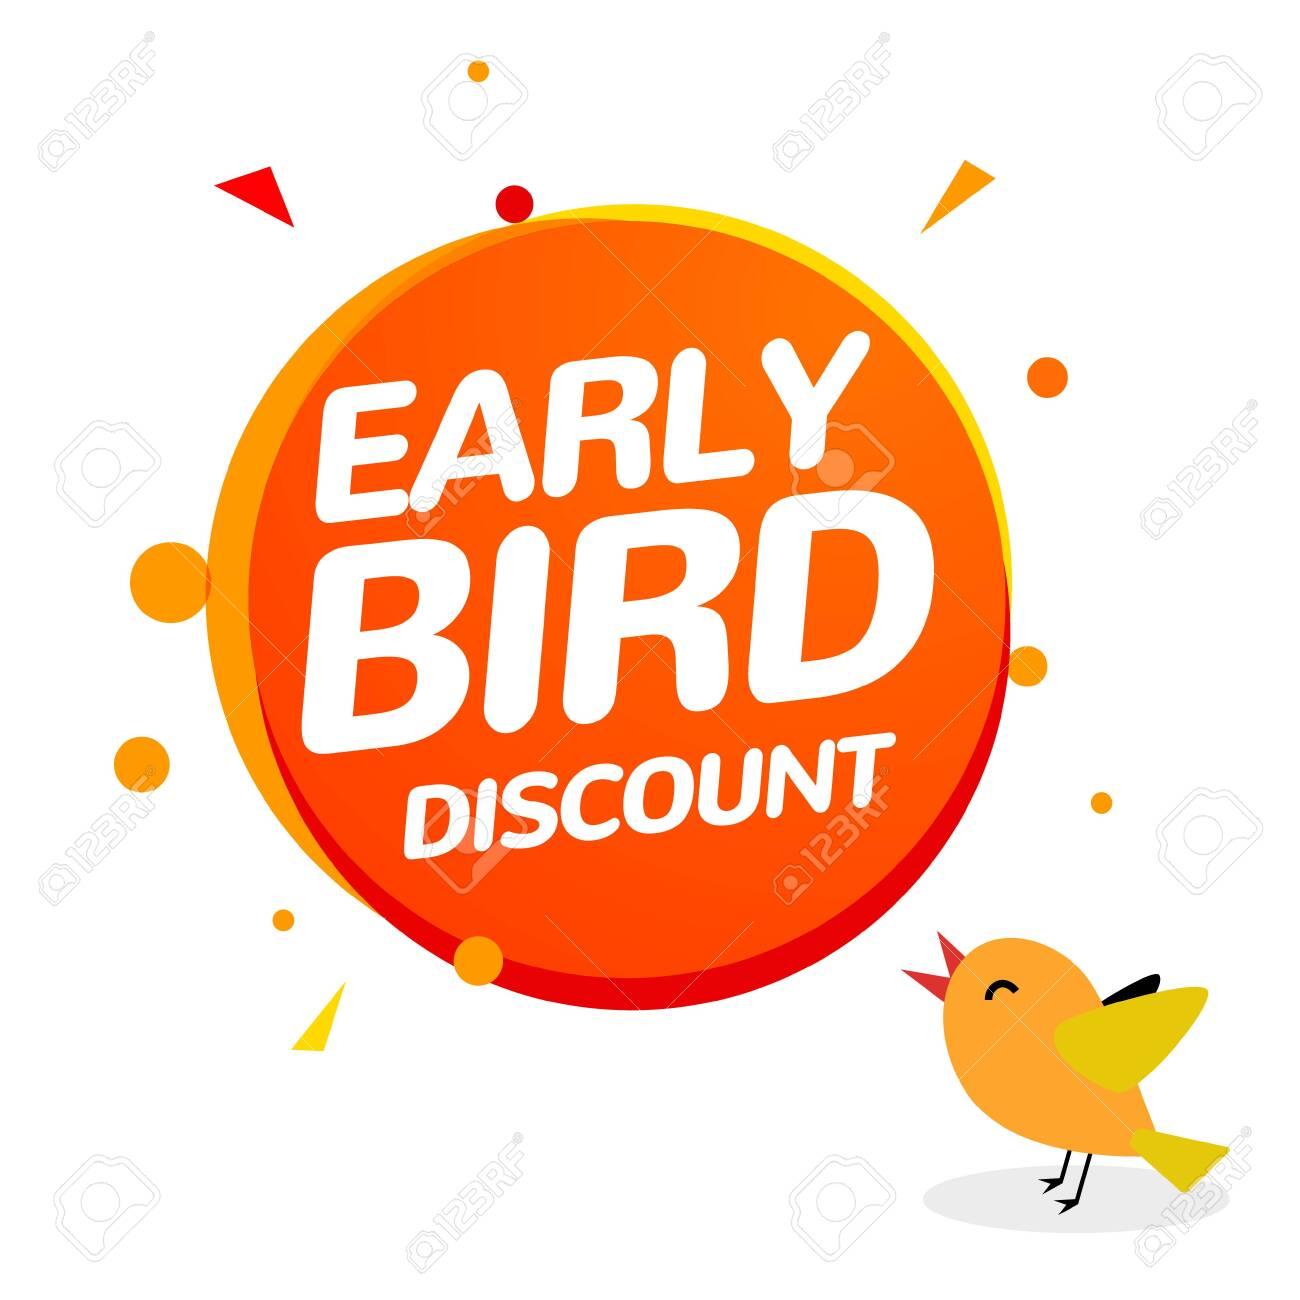 Early bird discount vector special offer sale icon. Early bird icon cartoon promo sign banner - 122354750